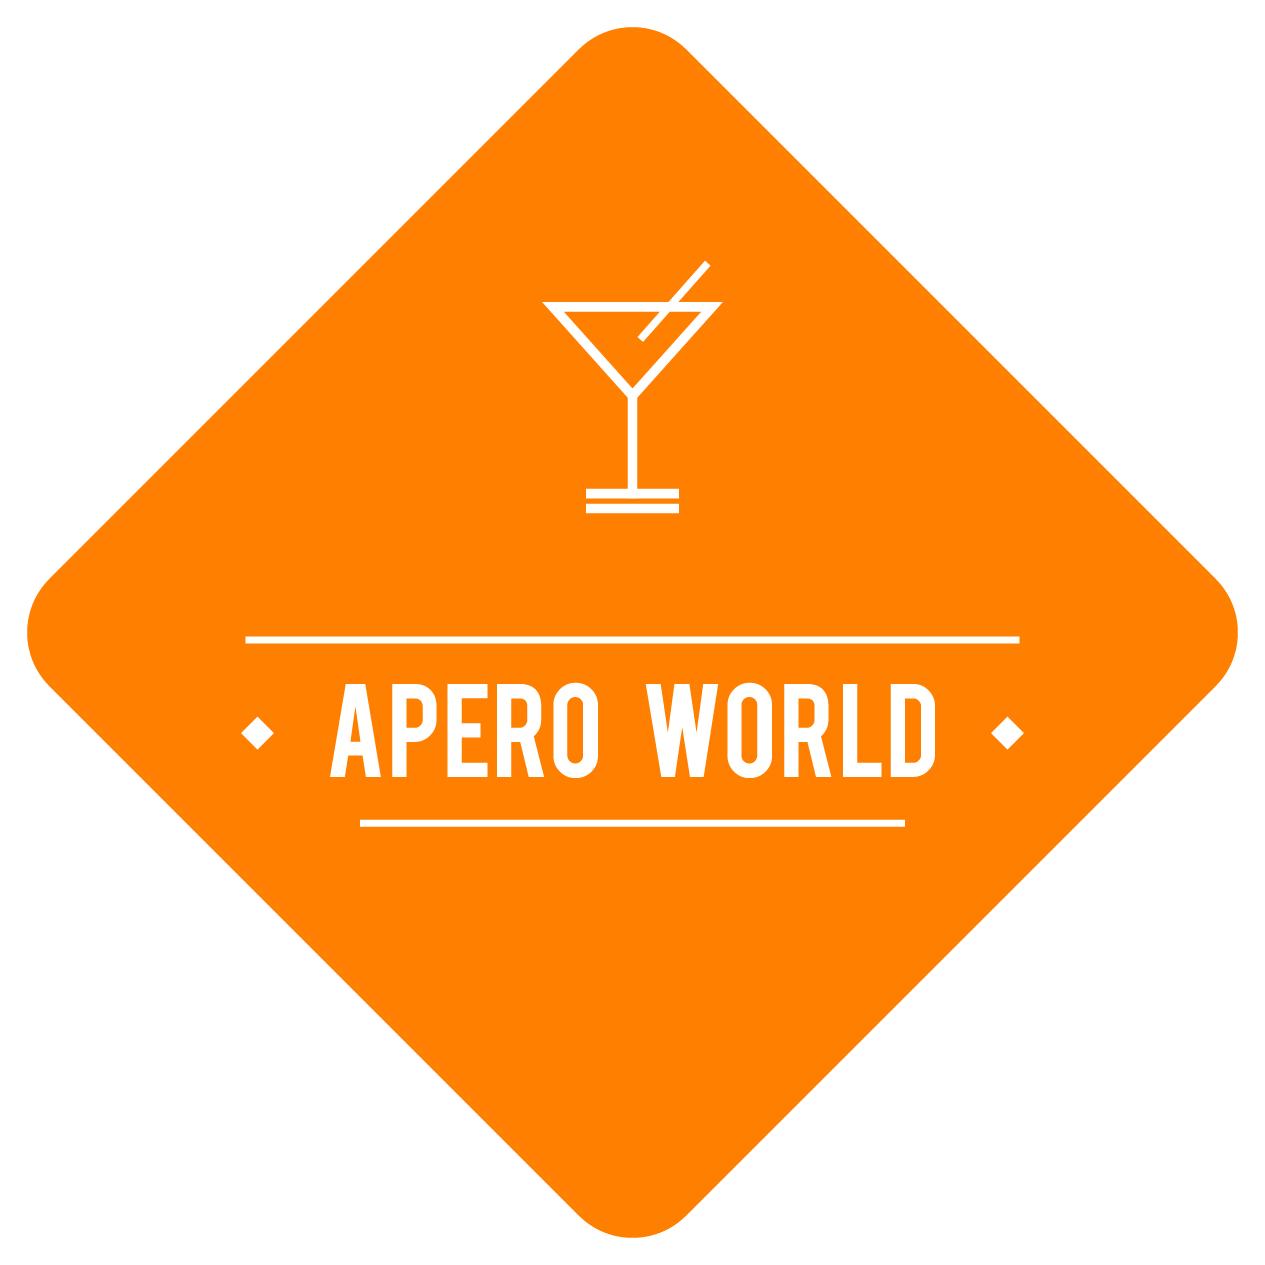 Apero world